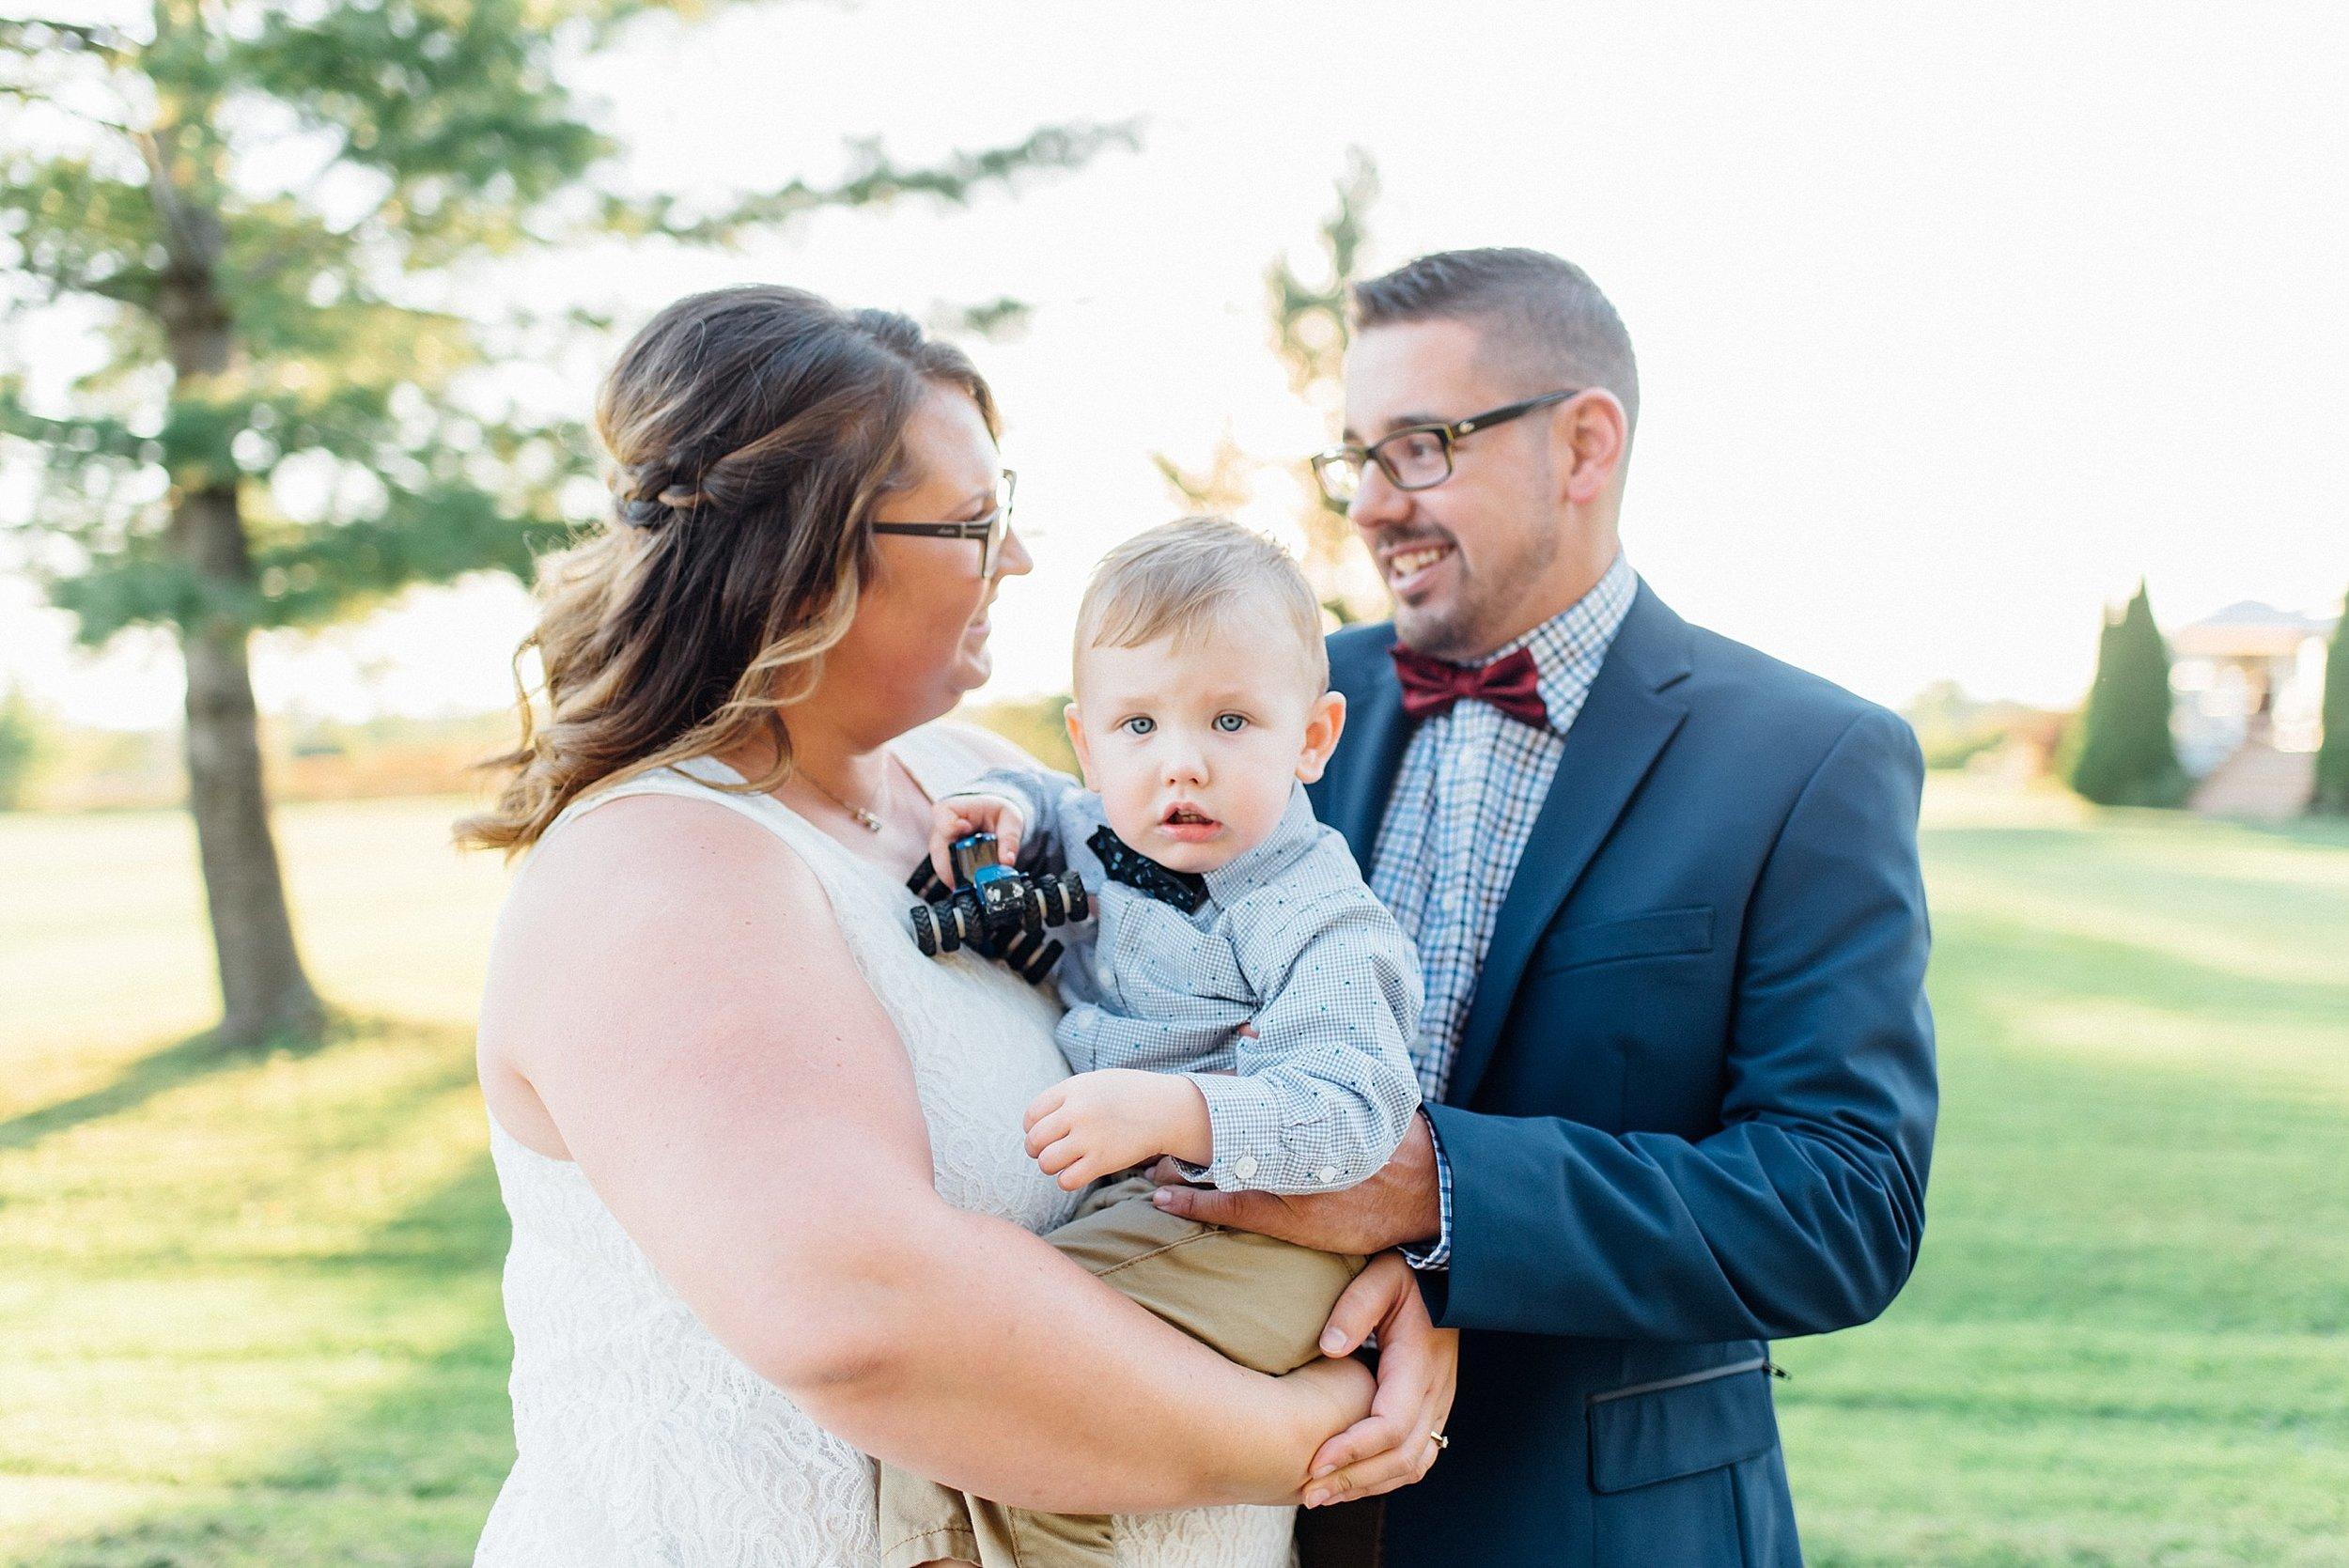 Ali and Batoul Photography - light, airy, indie documentary Ottawa wedding photographer_0161.jpg